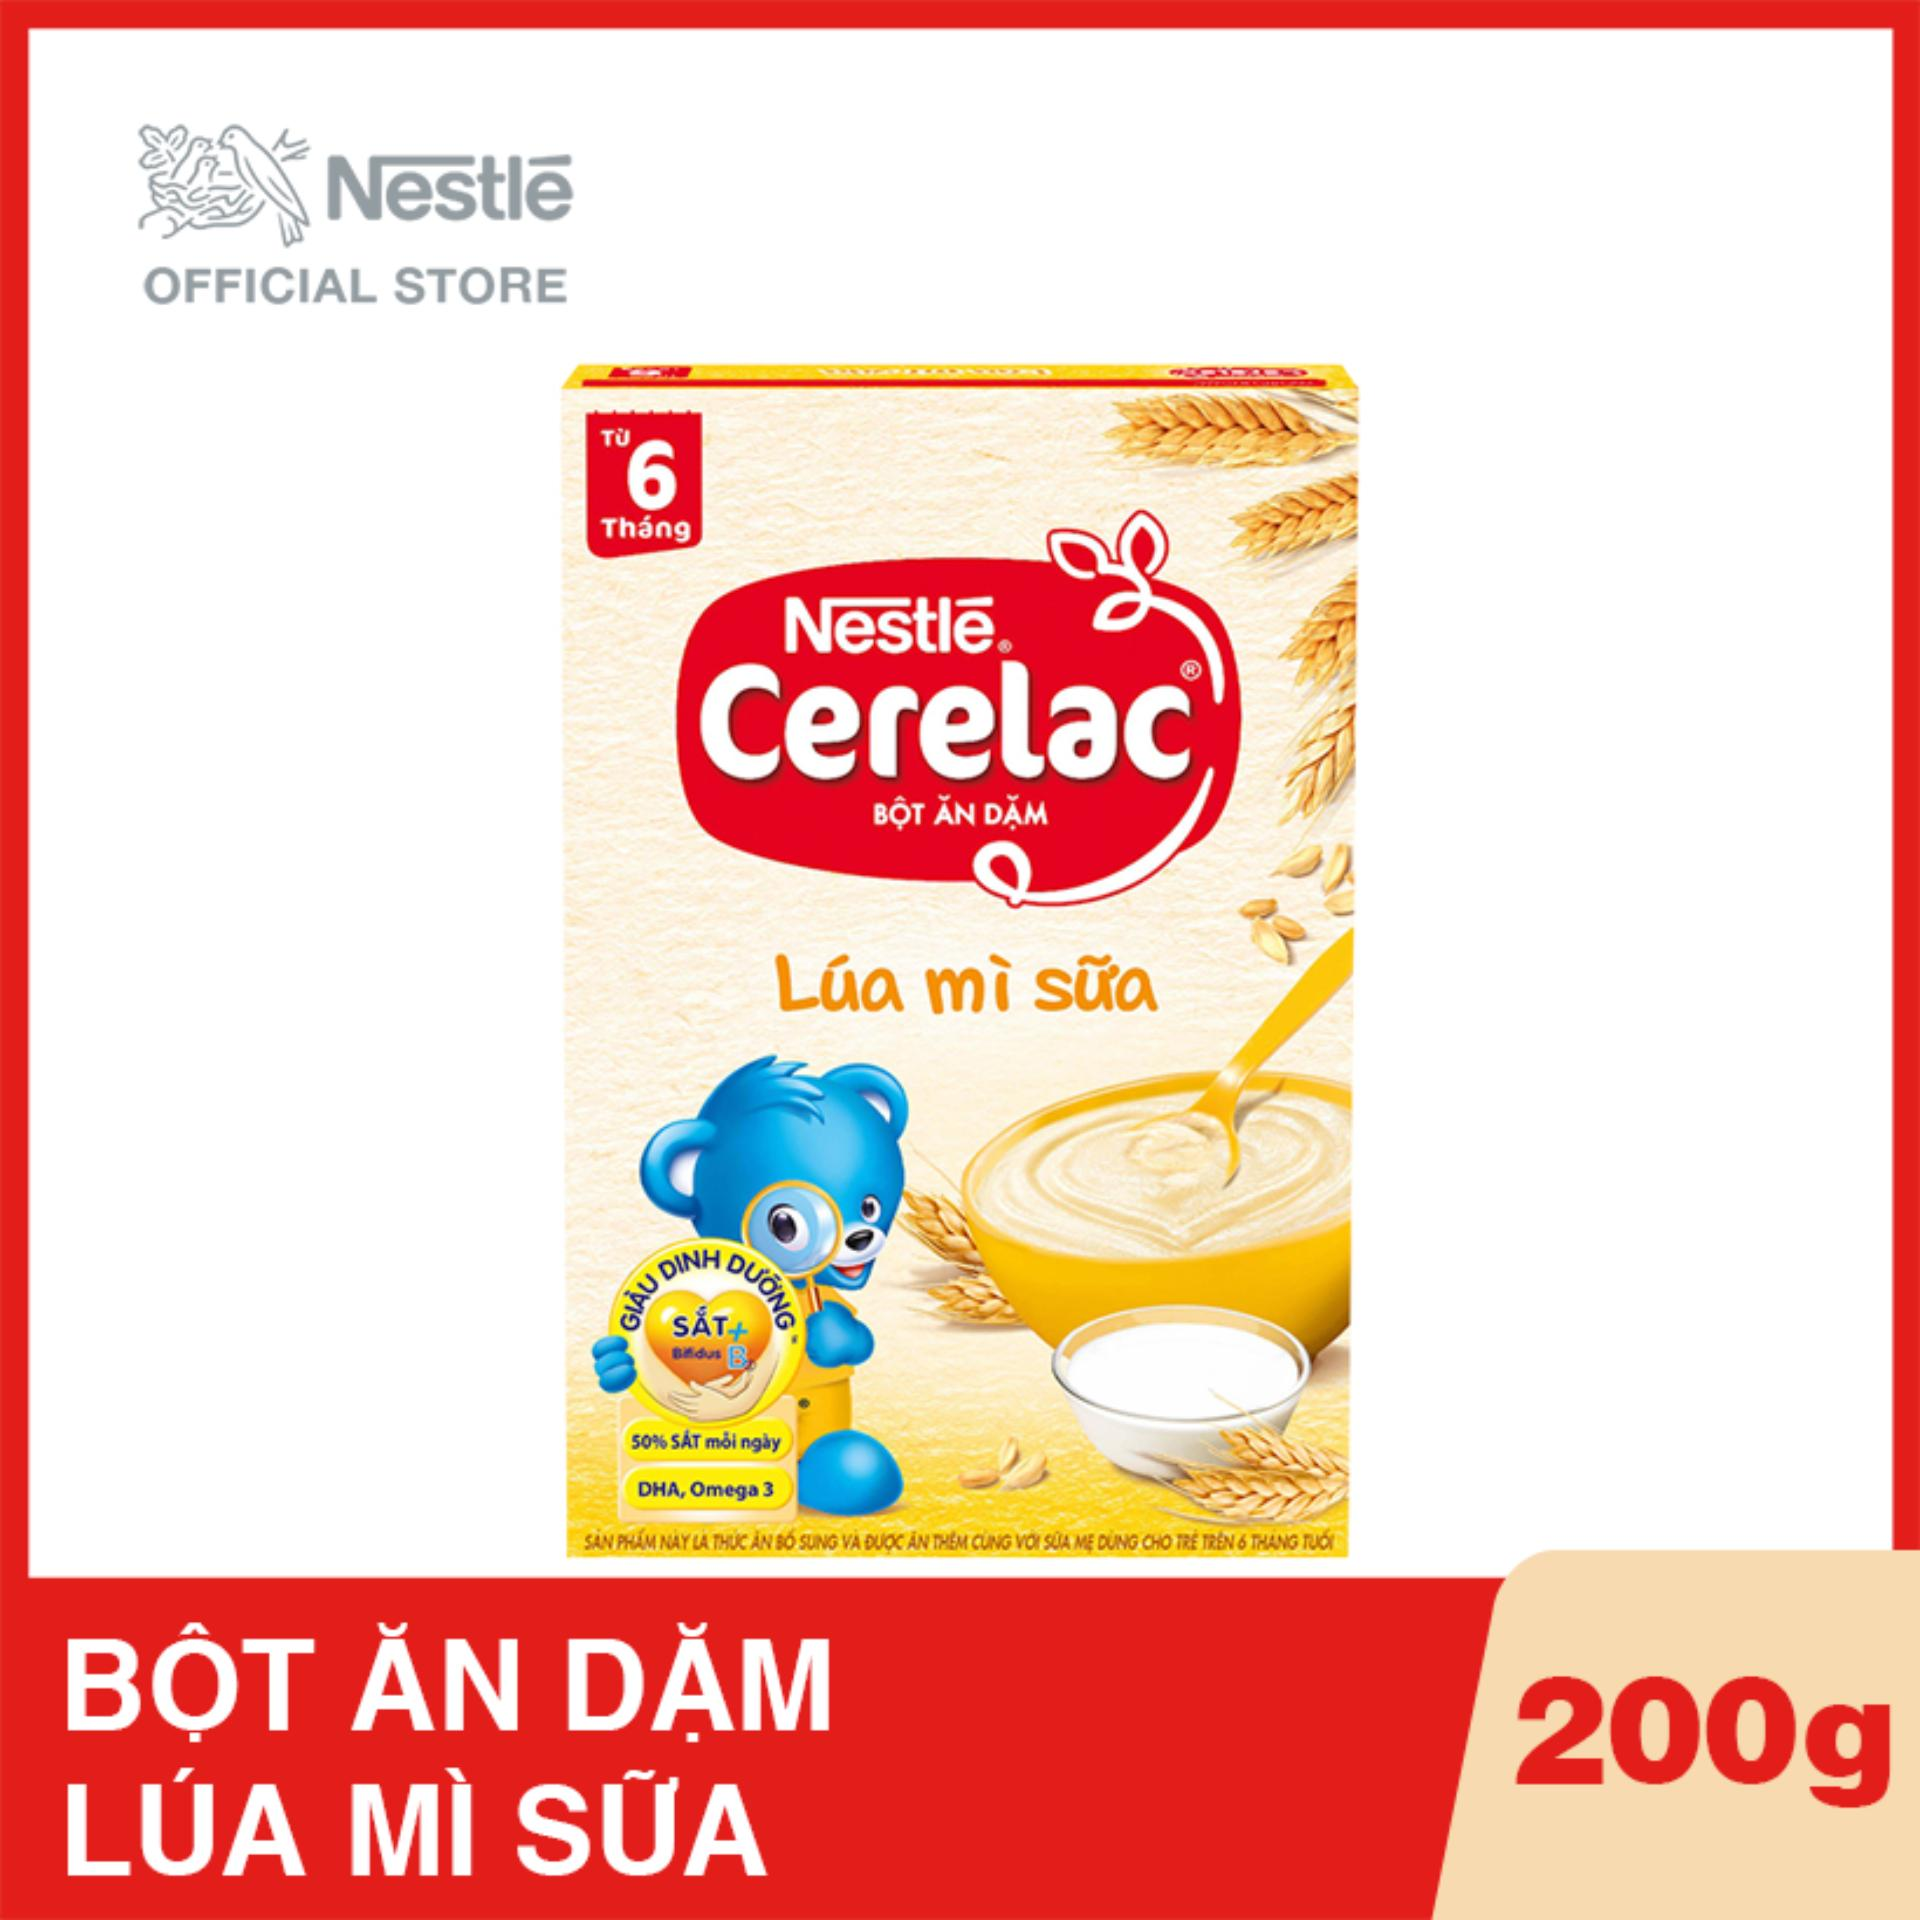 Hộp bột ăn dặm Nestlé CERELAC Lúa mì sữa - 200g